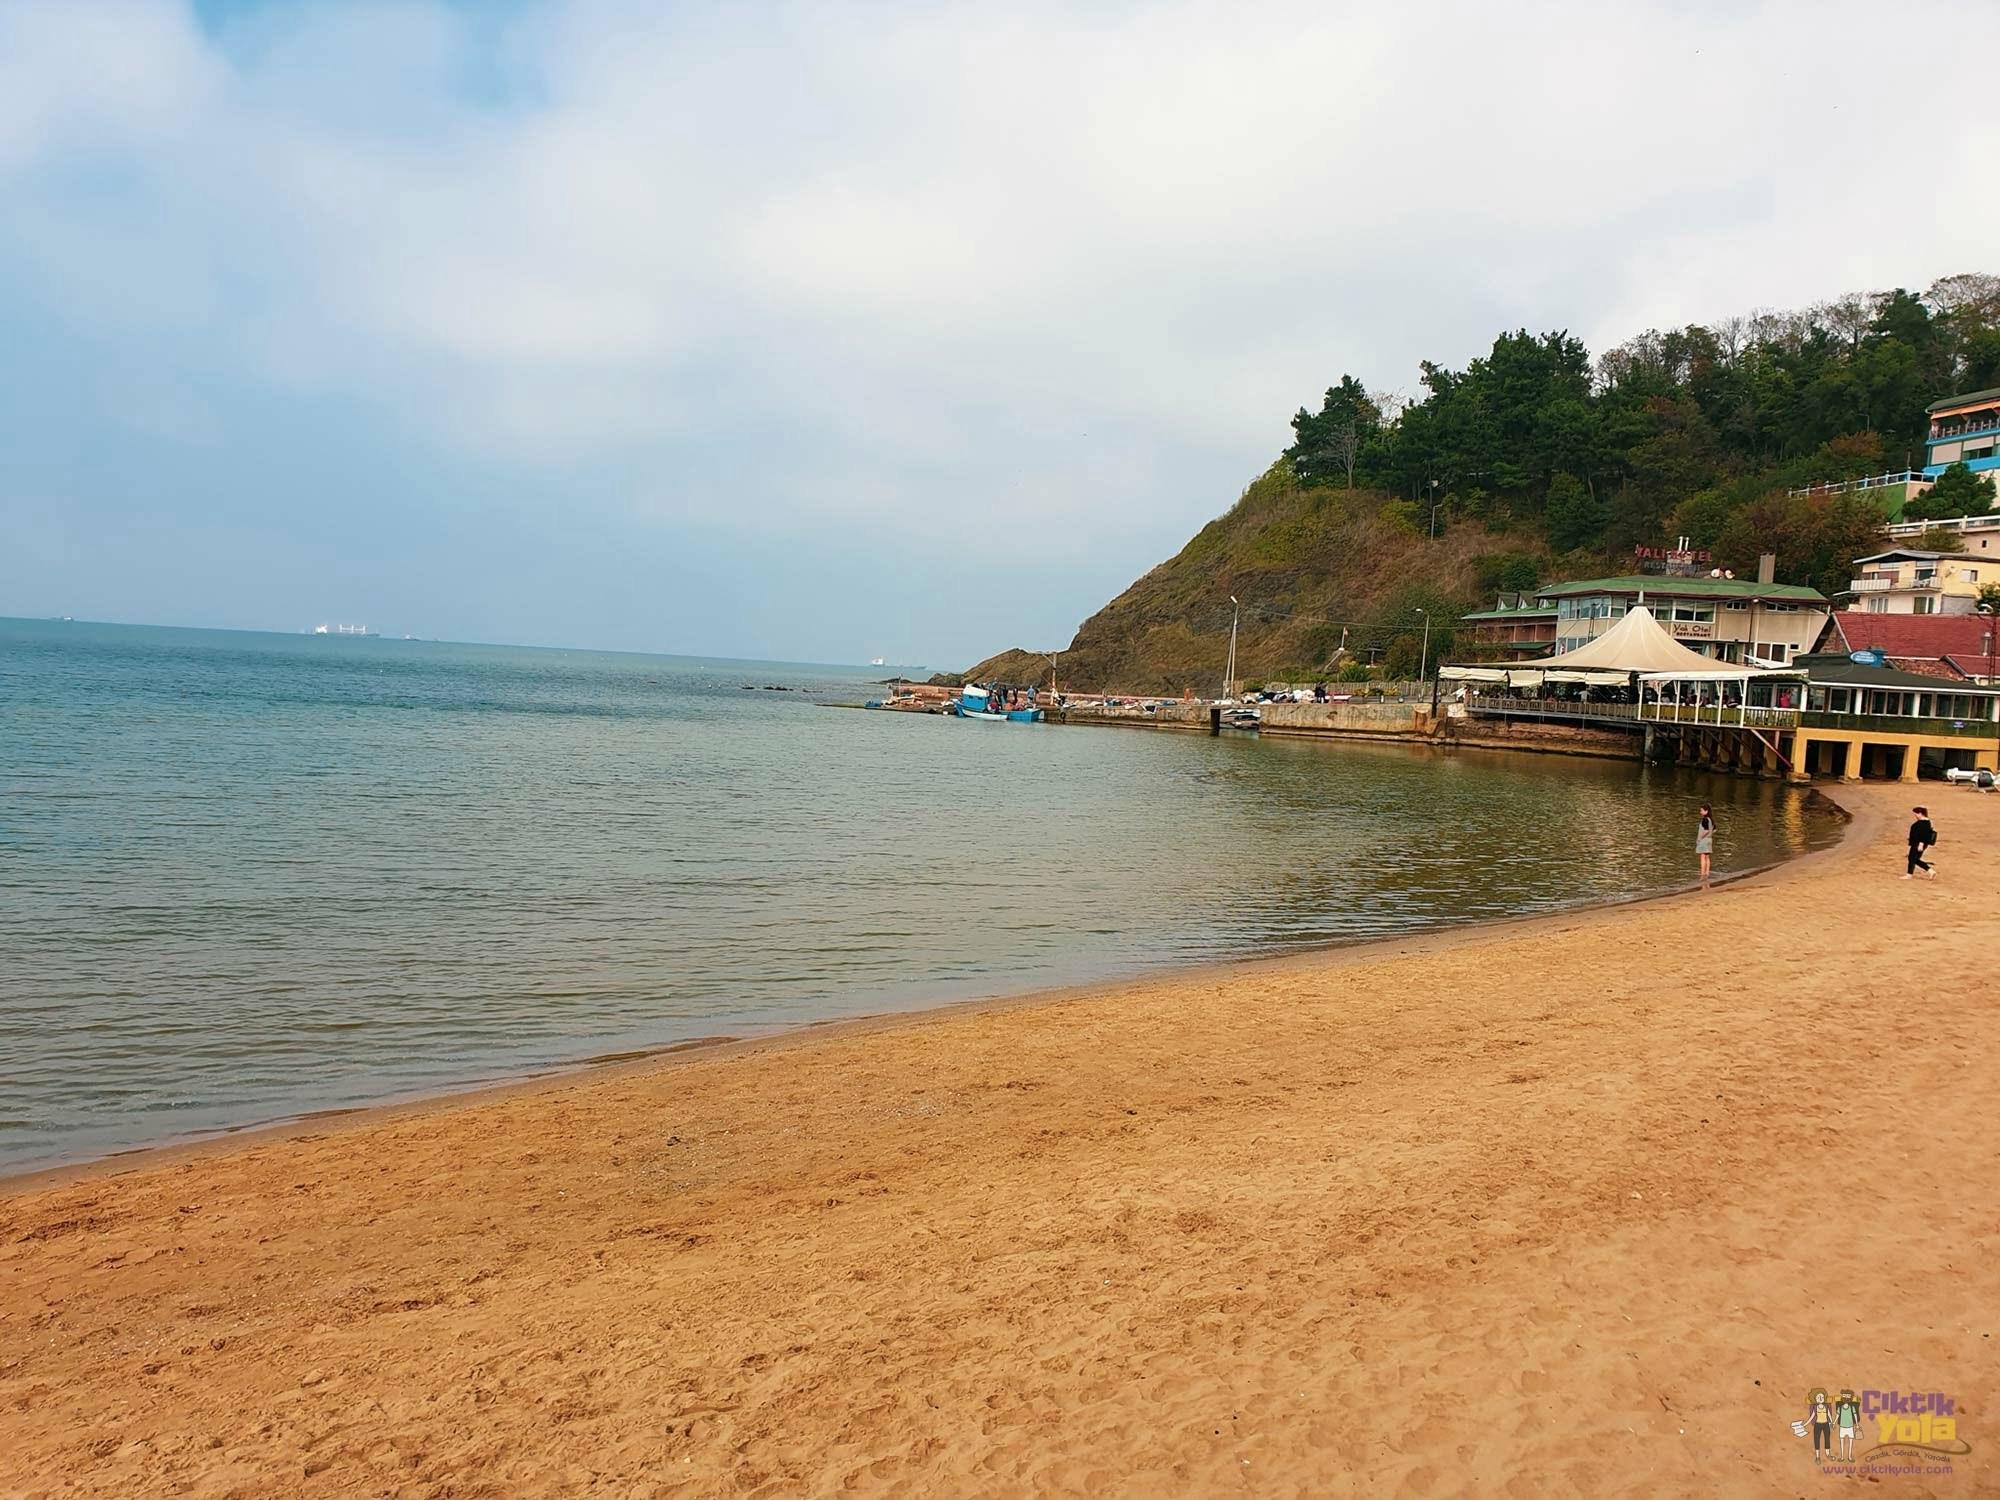 Kilyos Beachleri